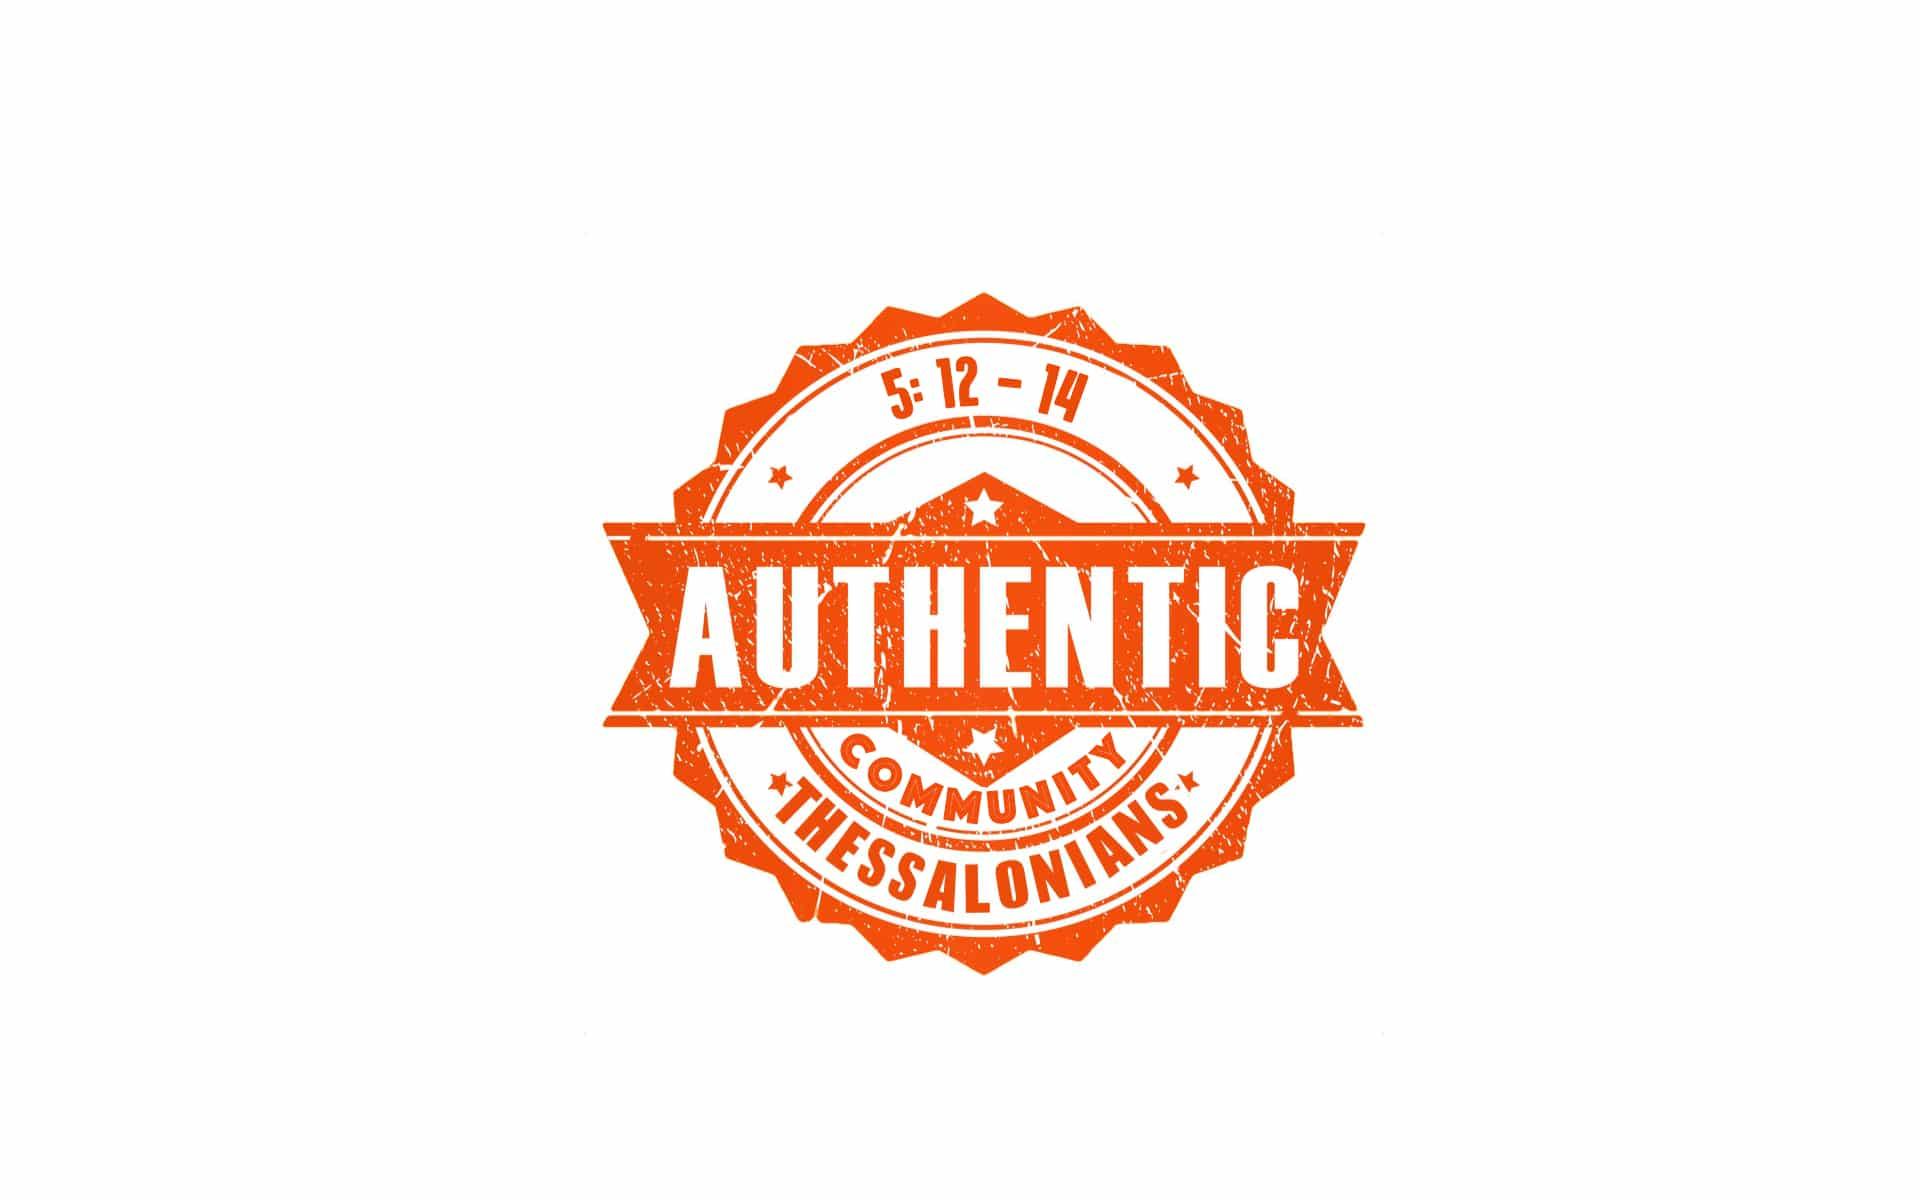 Authentic Community #1